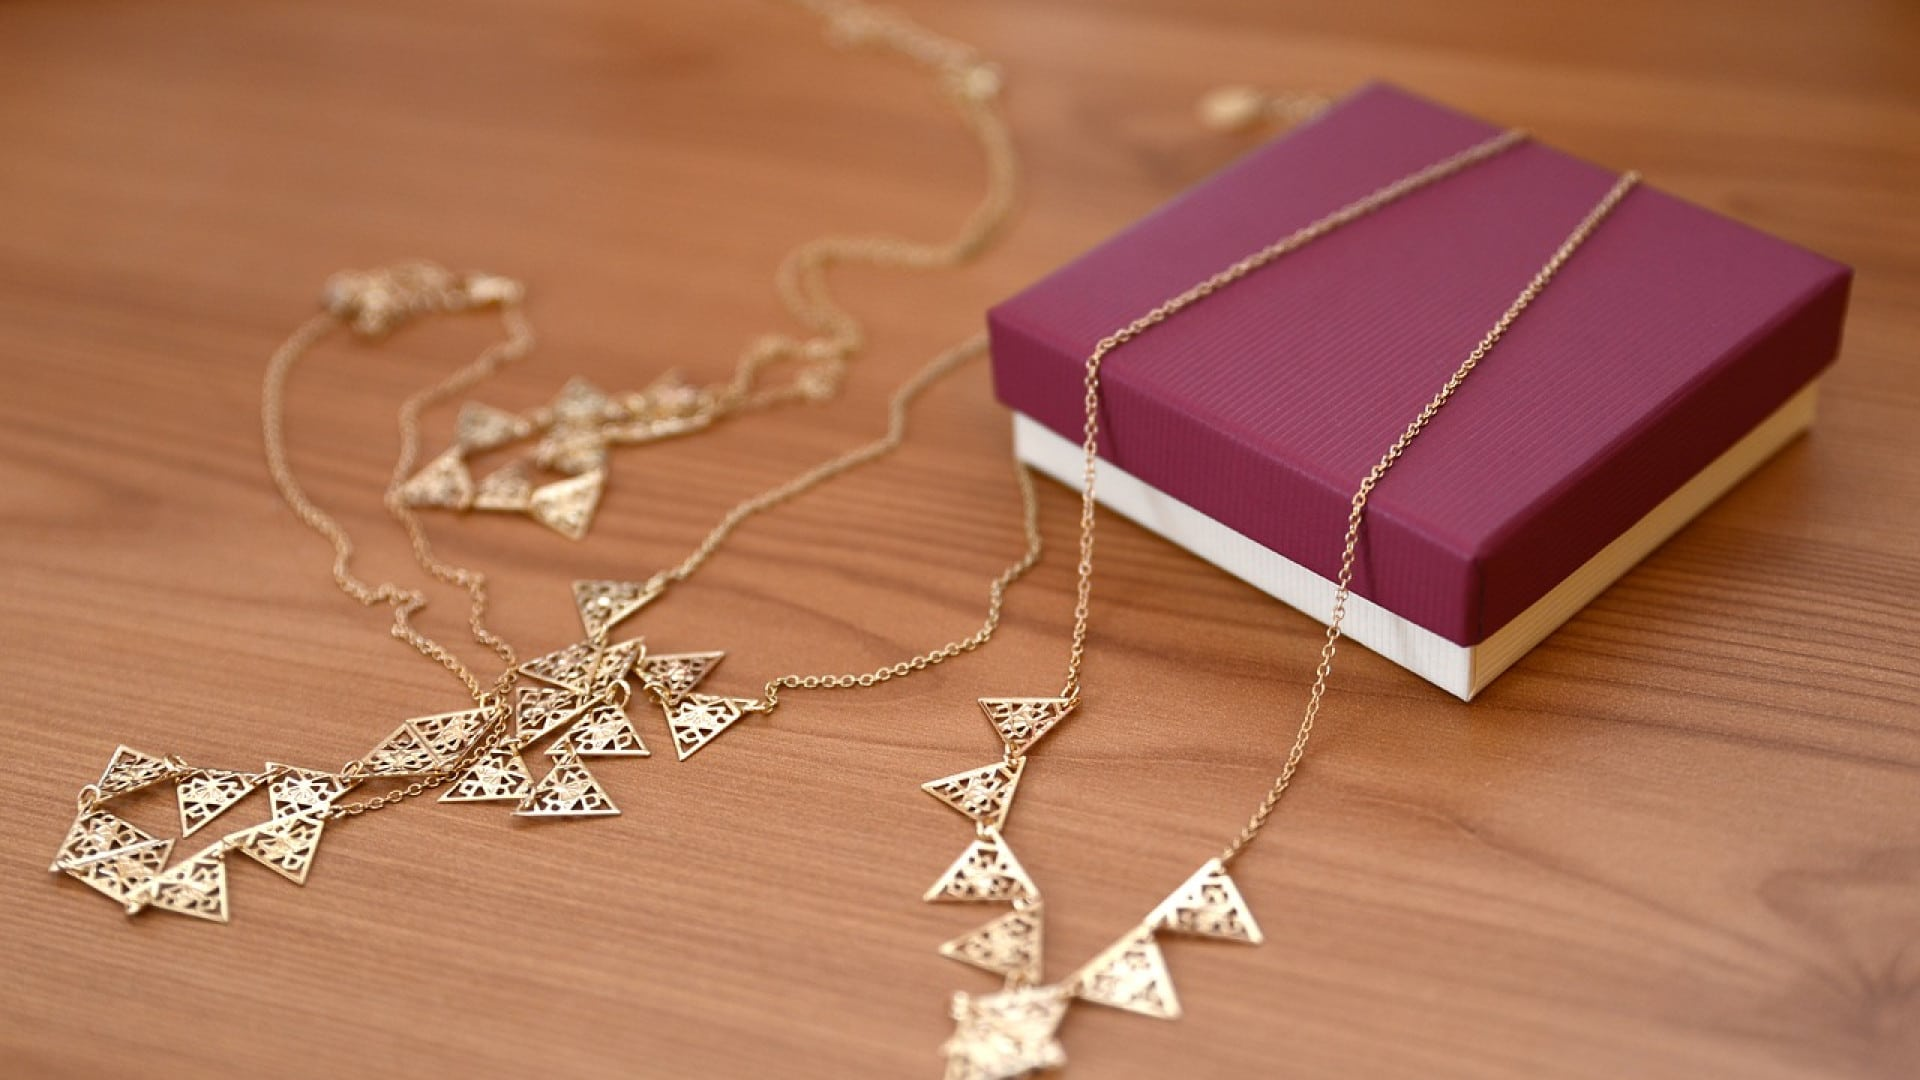 Comment choisir un bijou tendance ?